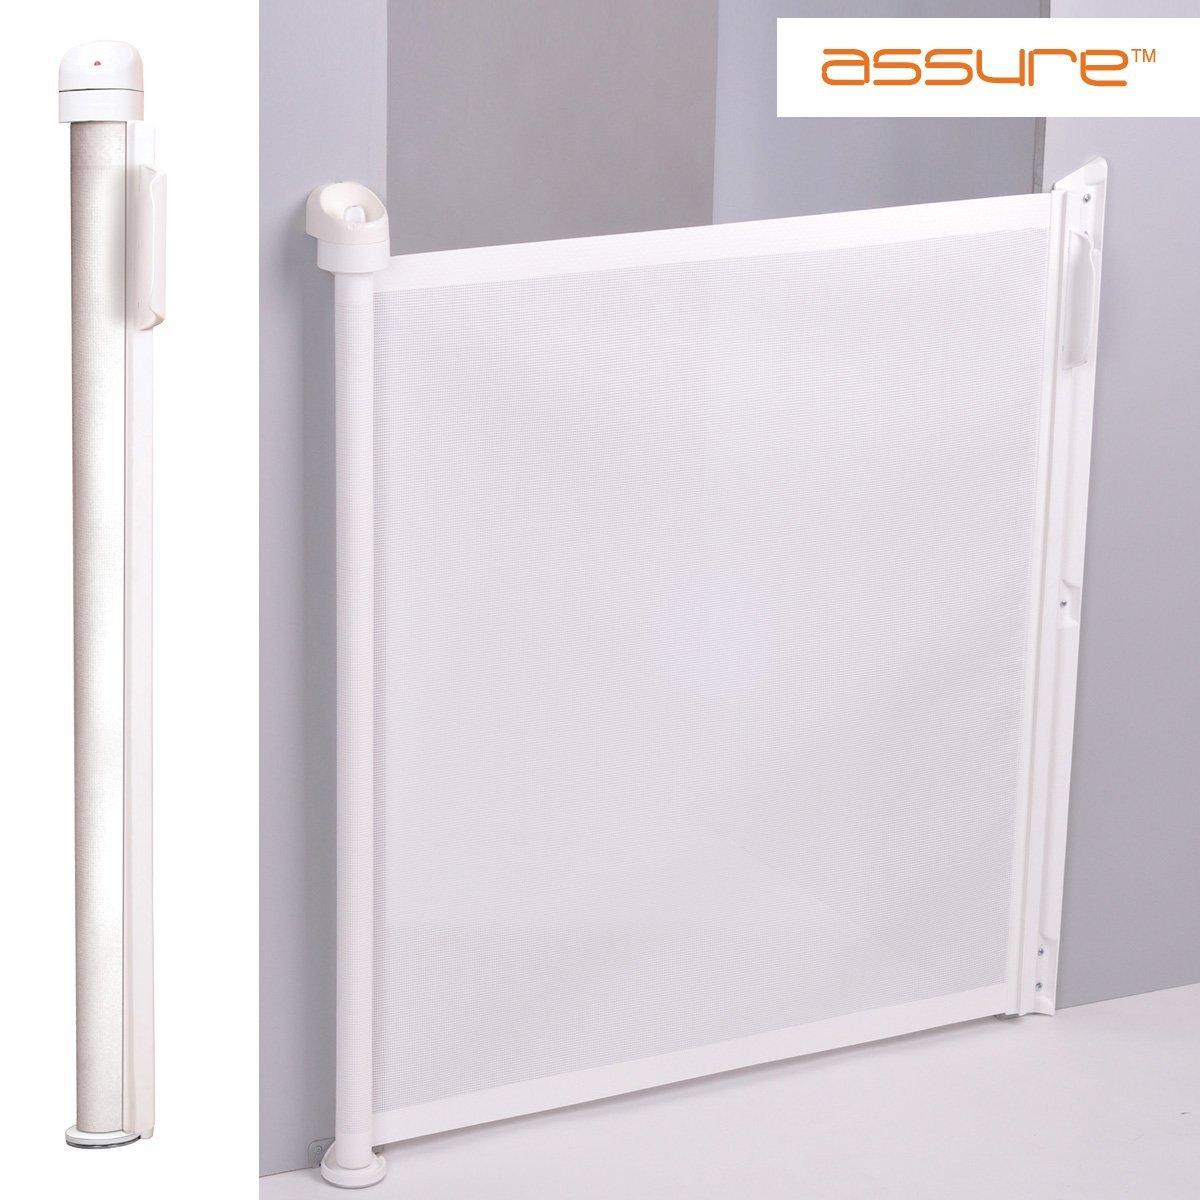 Lascal Kiddyguard Assure - White